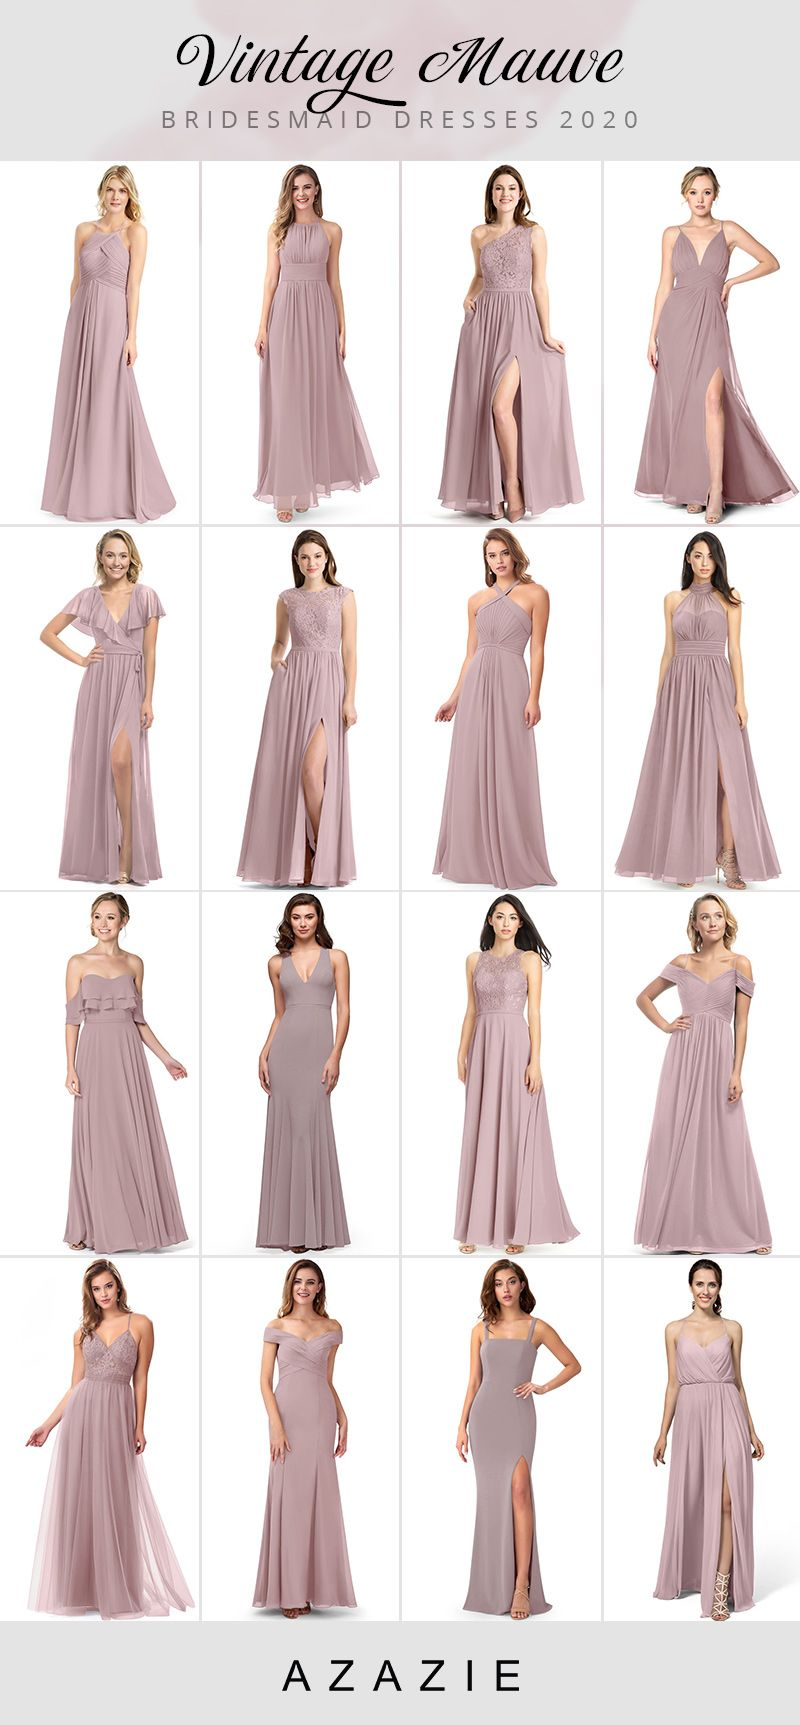 Vintage Mauve Bridesmaid Dresses At Affordable Prices In 2020 Mauve Bridesmaid Dress Vintage Bridesmaid Dresses Muave Bridesmaid Dresses